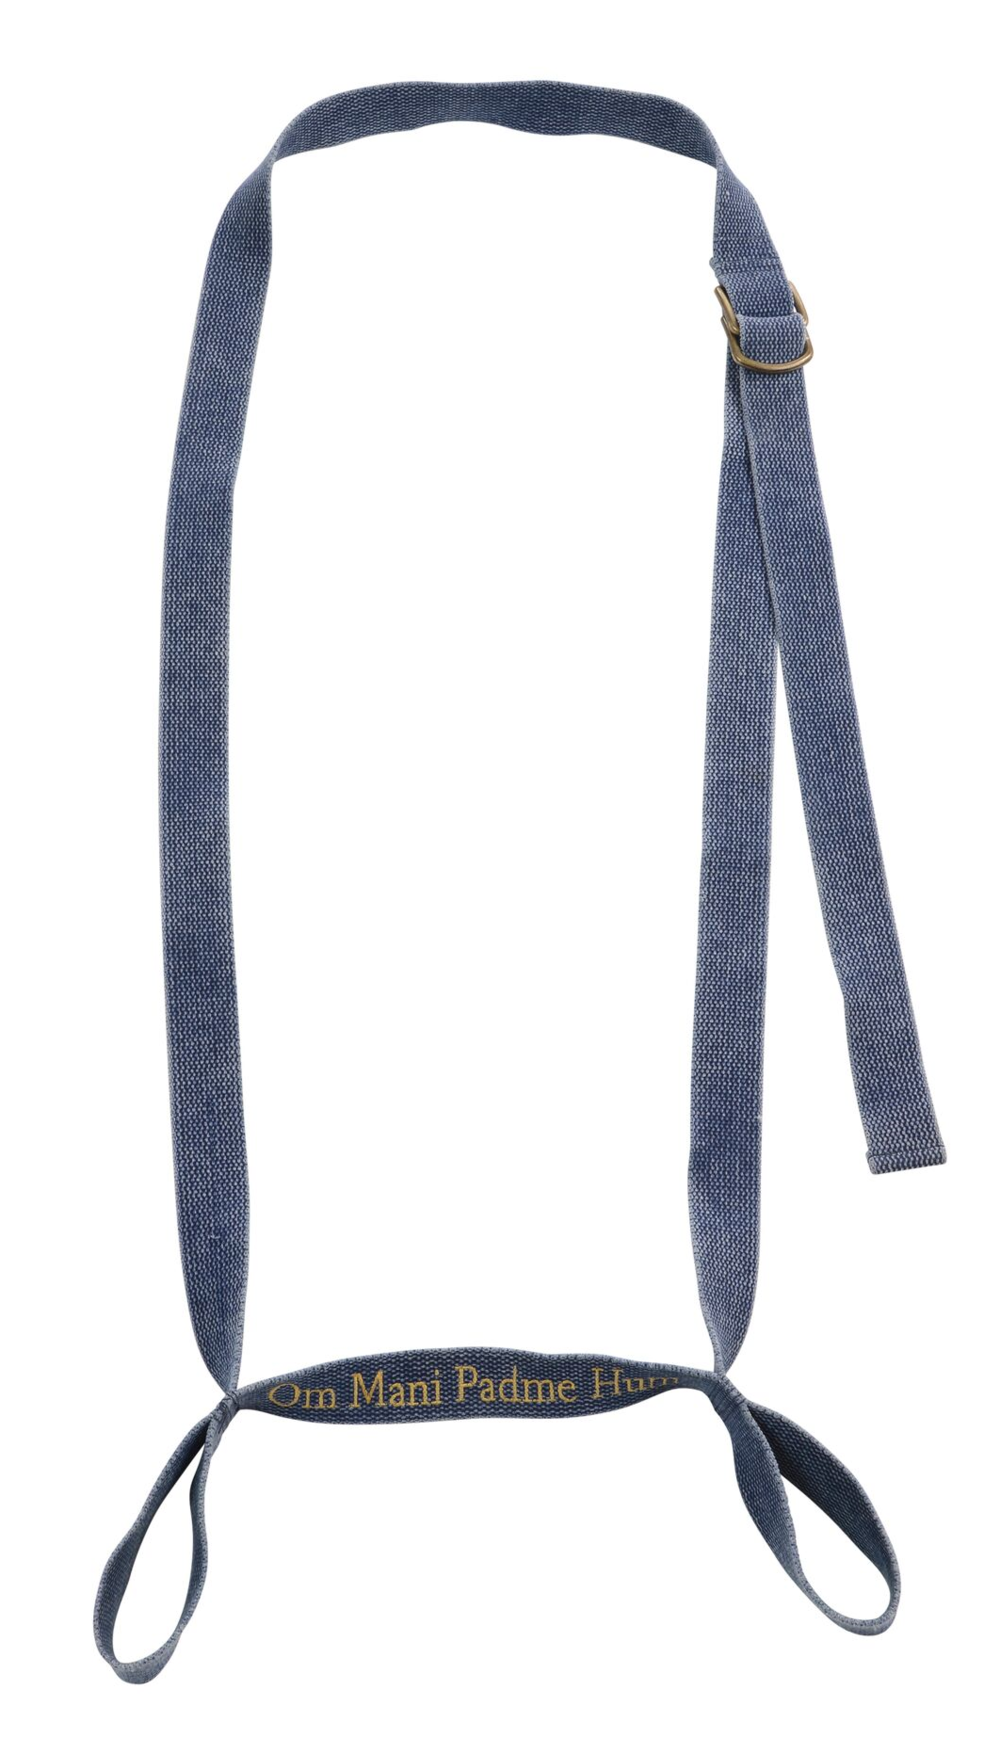 HastaPada: Original Lasso Adjustable Side Loop